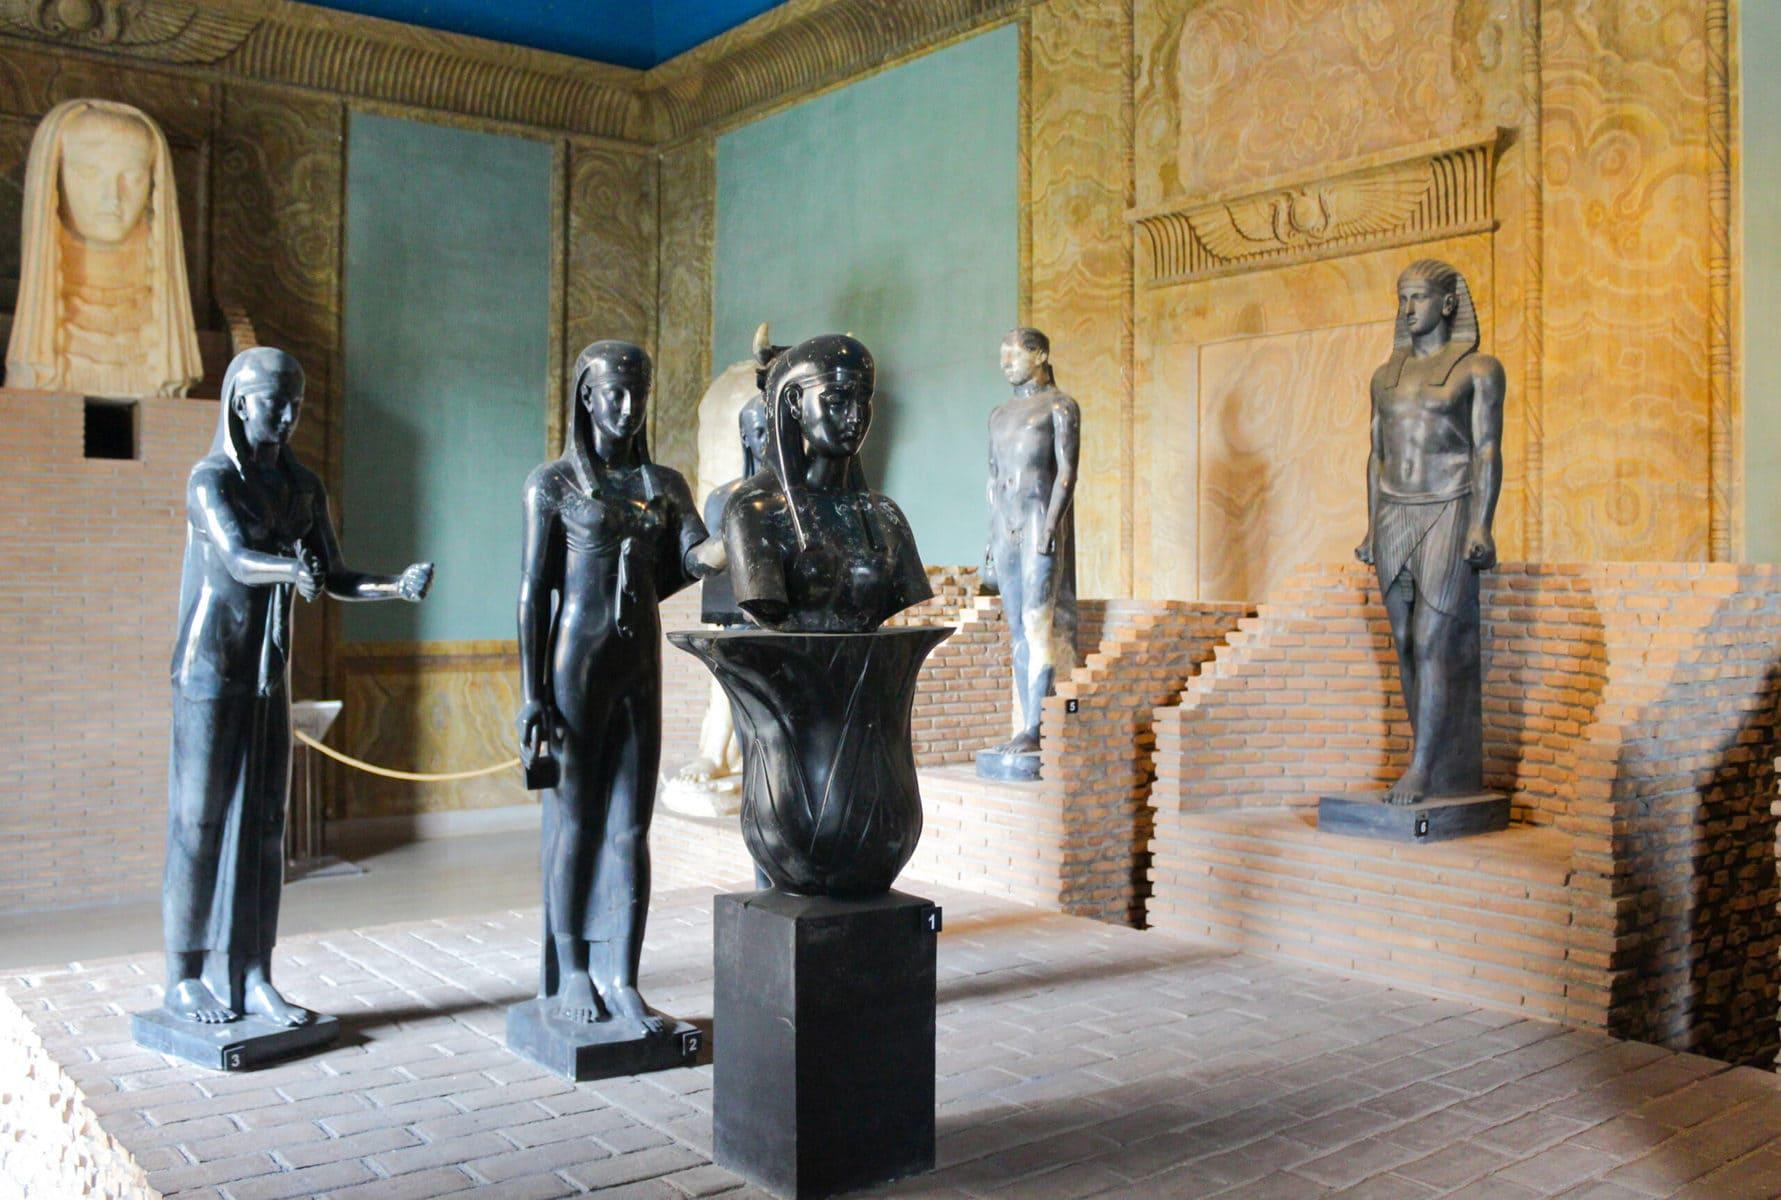 Ägyptisches Museum der Vatikanischen Museen, Rom